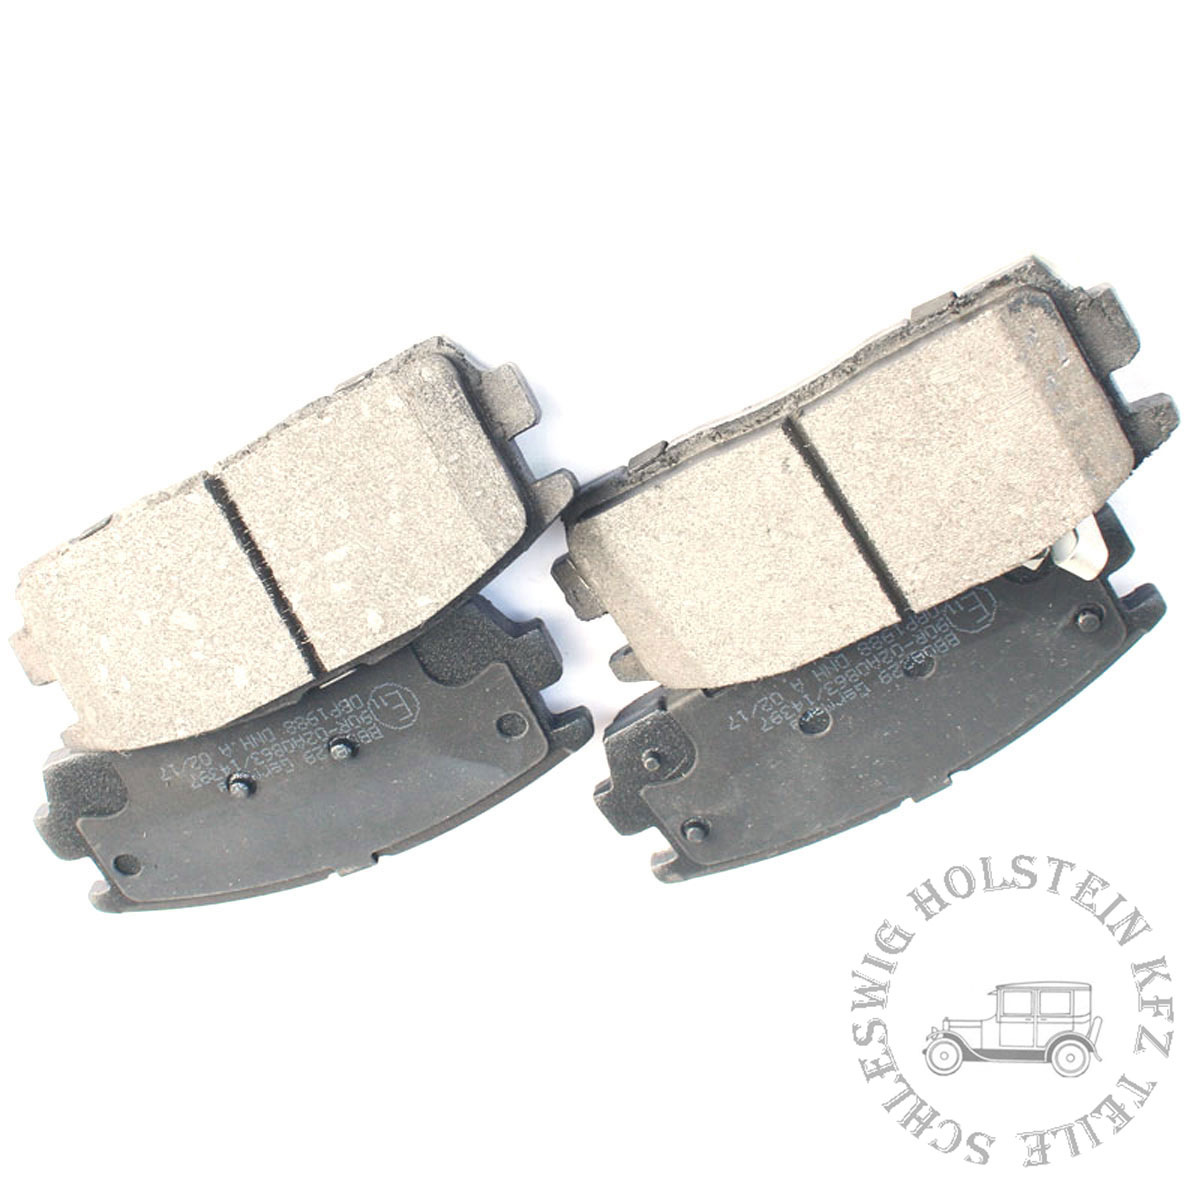 BB.8186 Bremsbelagsatz Brake pads Hinterachse Ford Jaguar